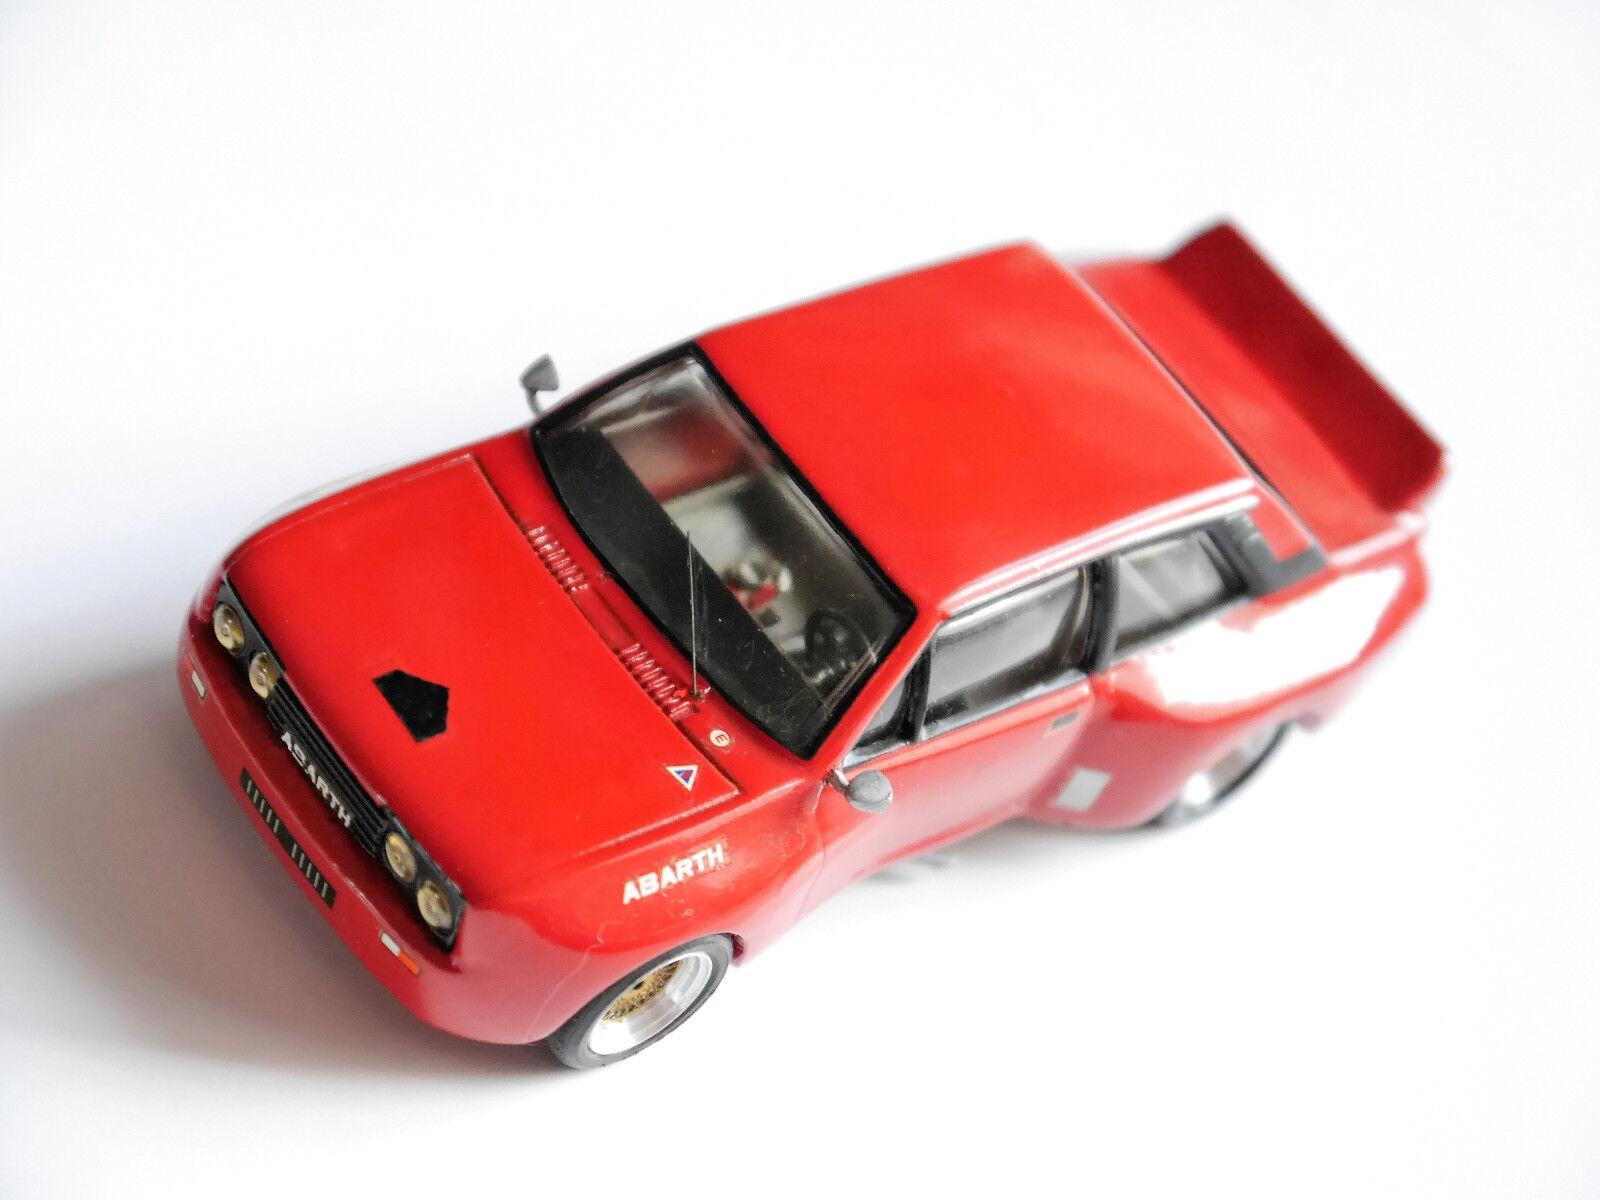 Fiat Abarth 031   131 mirafiori, Handarbeit Handarbeit Handarbeit handmade   RIVA Models in 1 43 d4f726